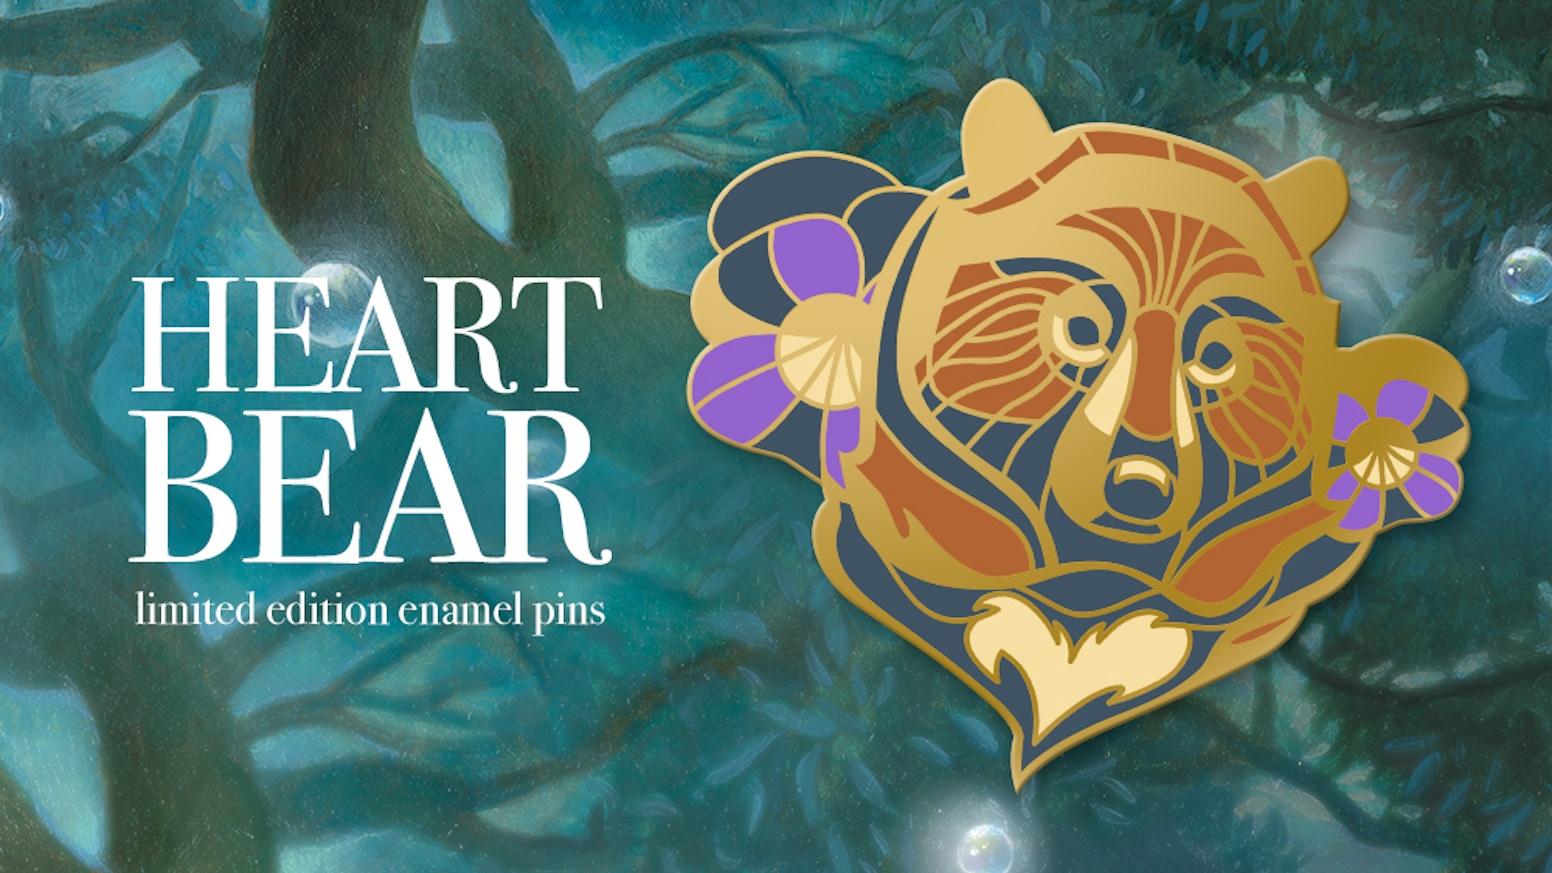 Heart Bear is a limited edition hard enamel pins based on my bear drawings.